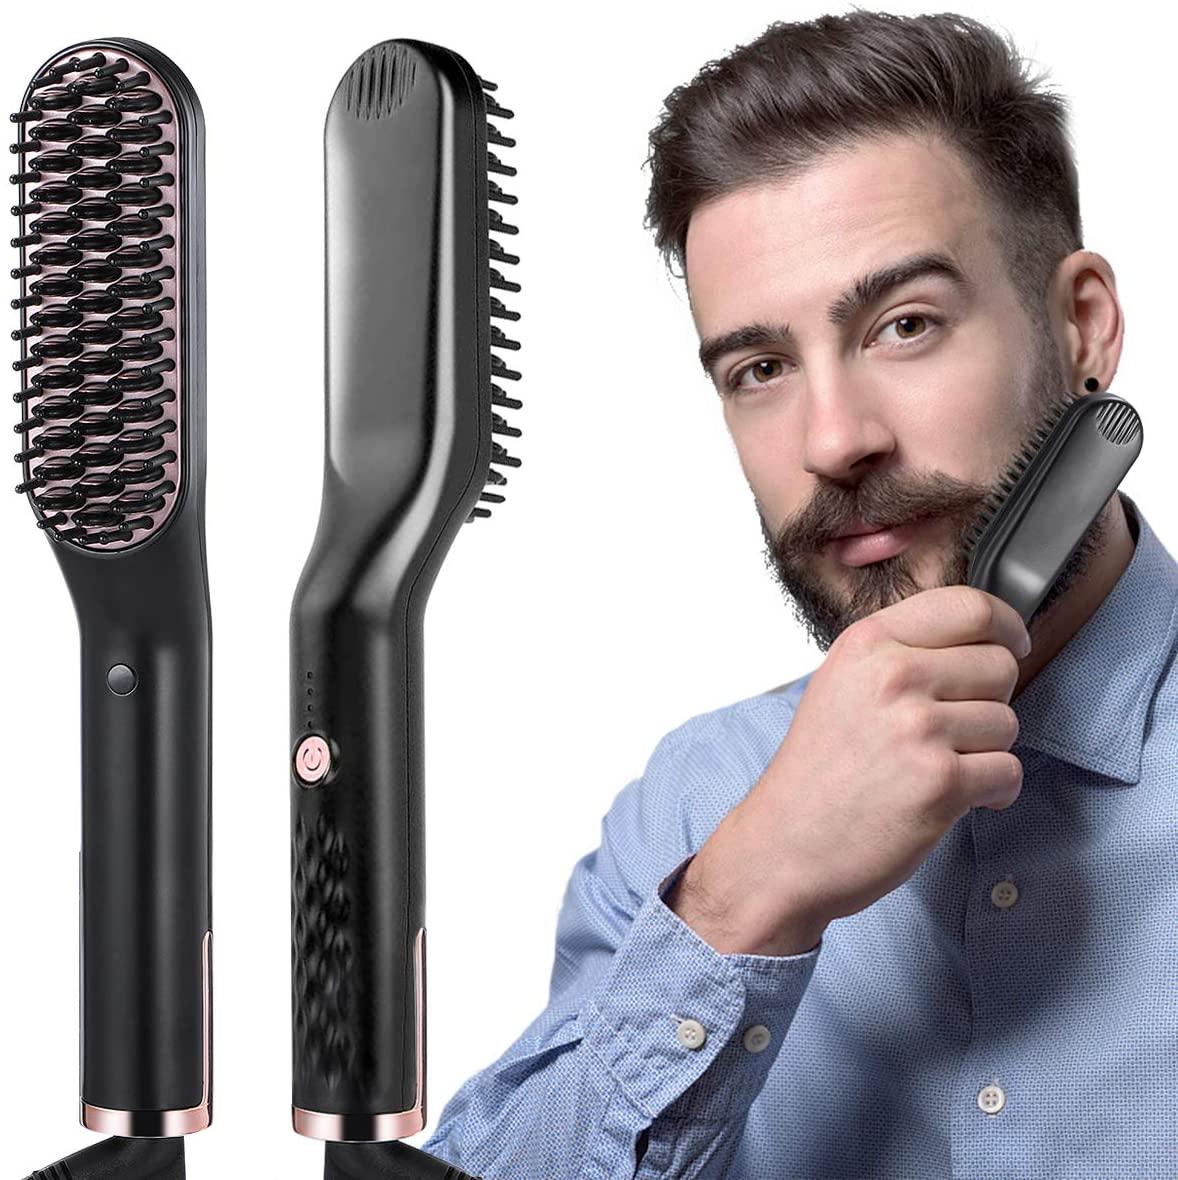 liaboe Cepillo Alisador de Barba 3 in 1 Profesional